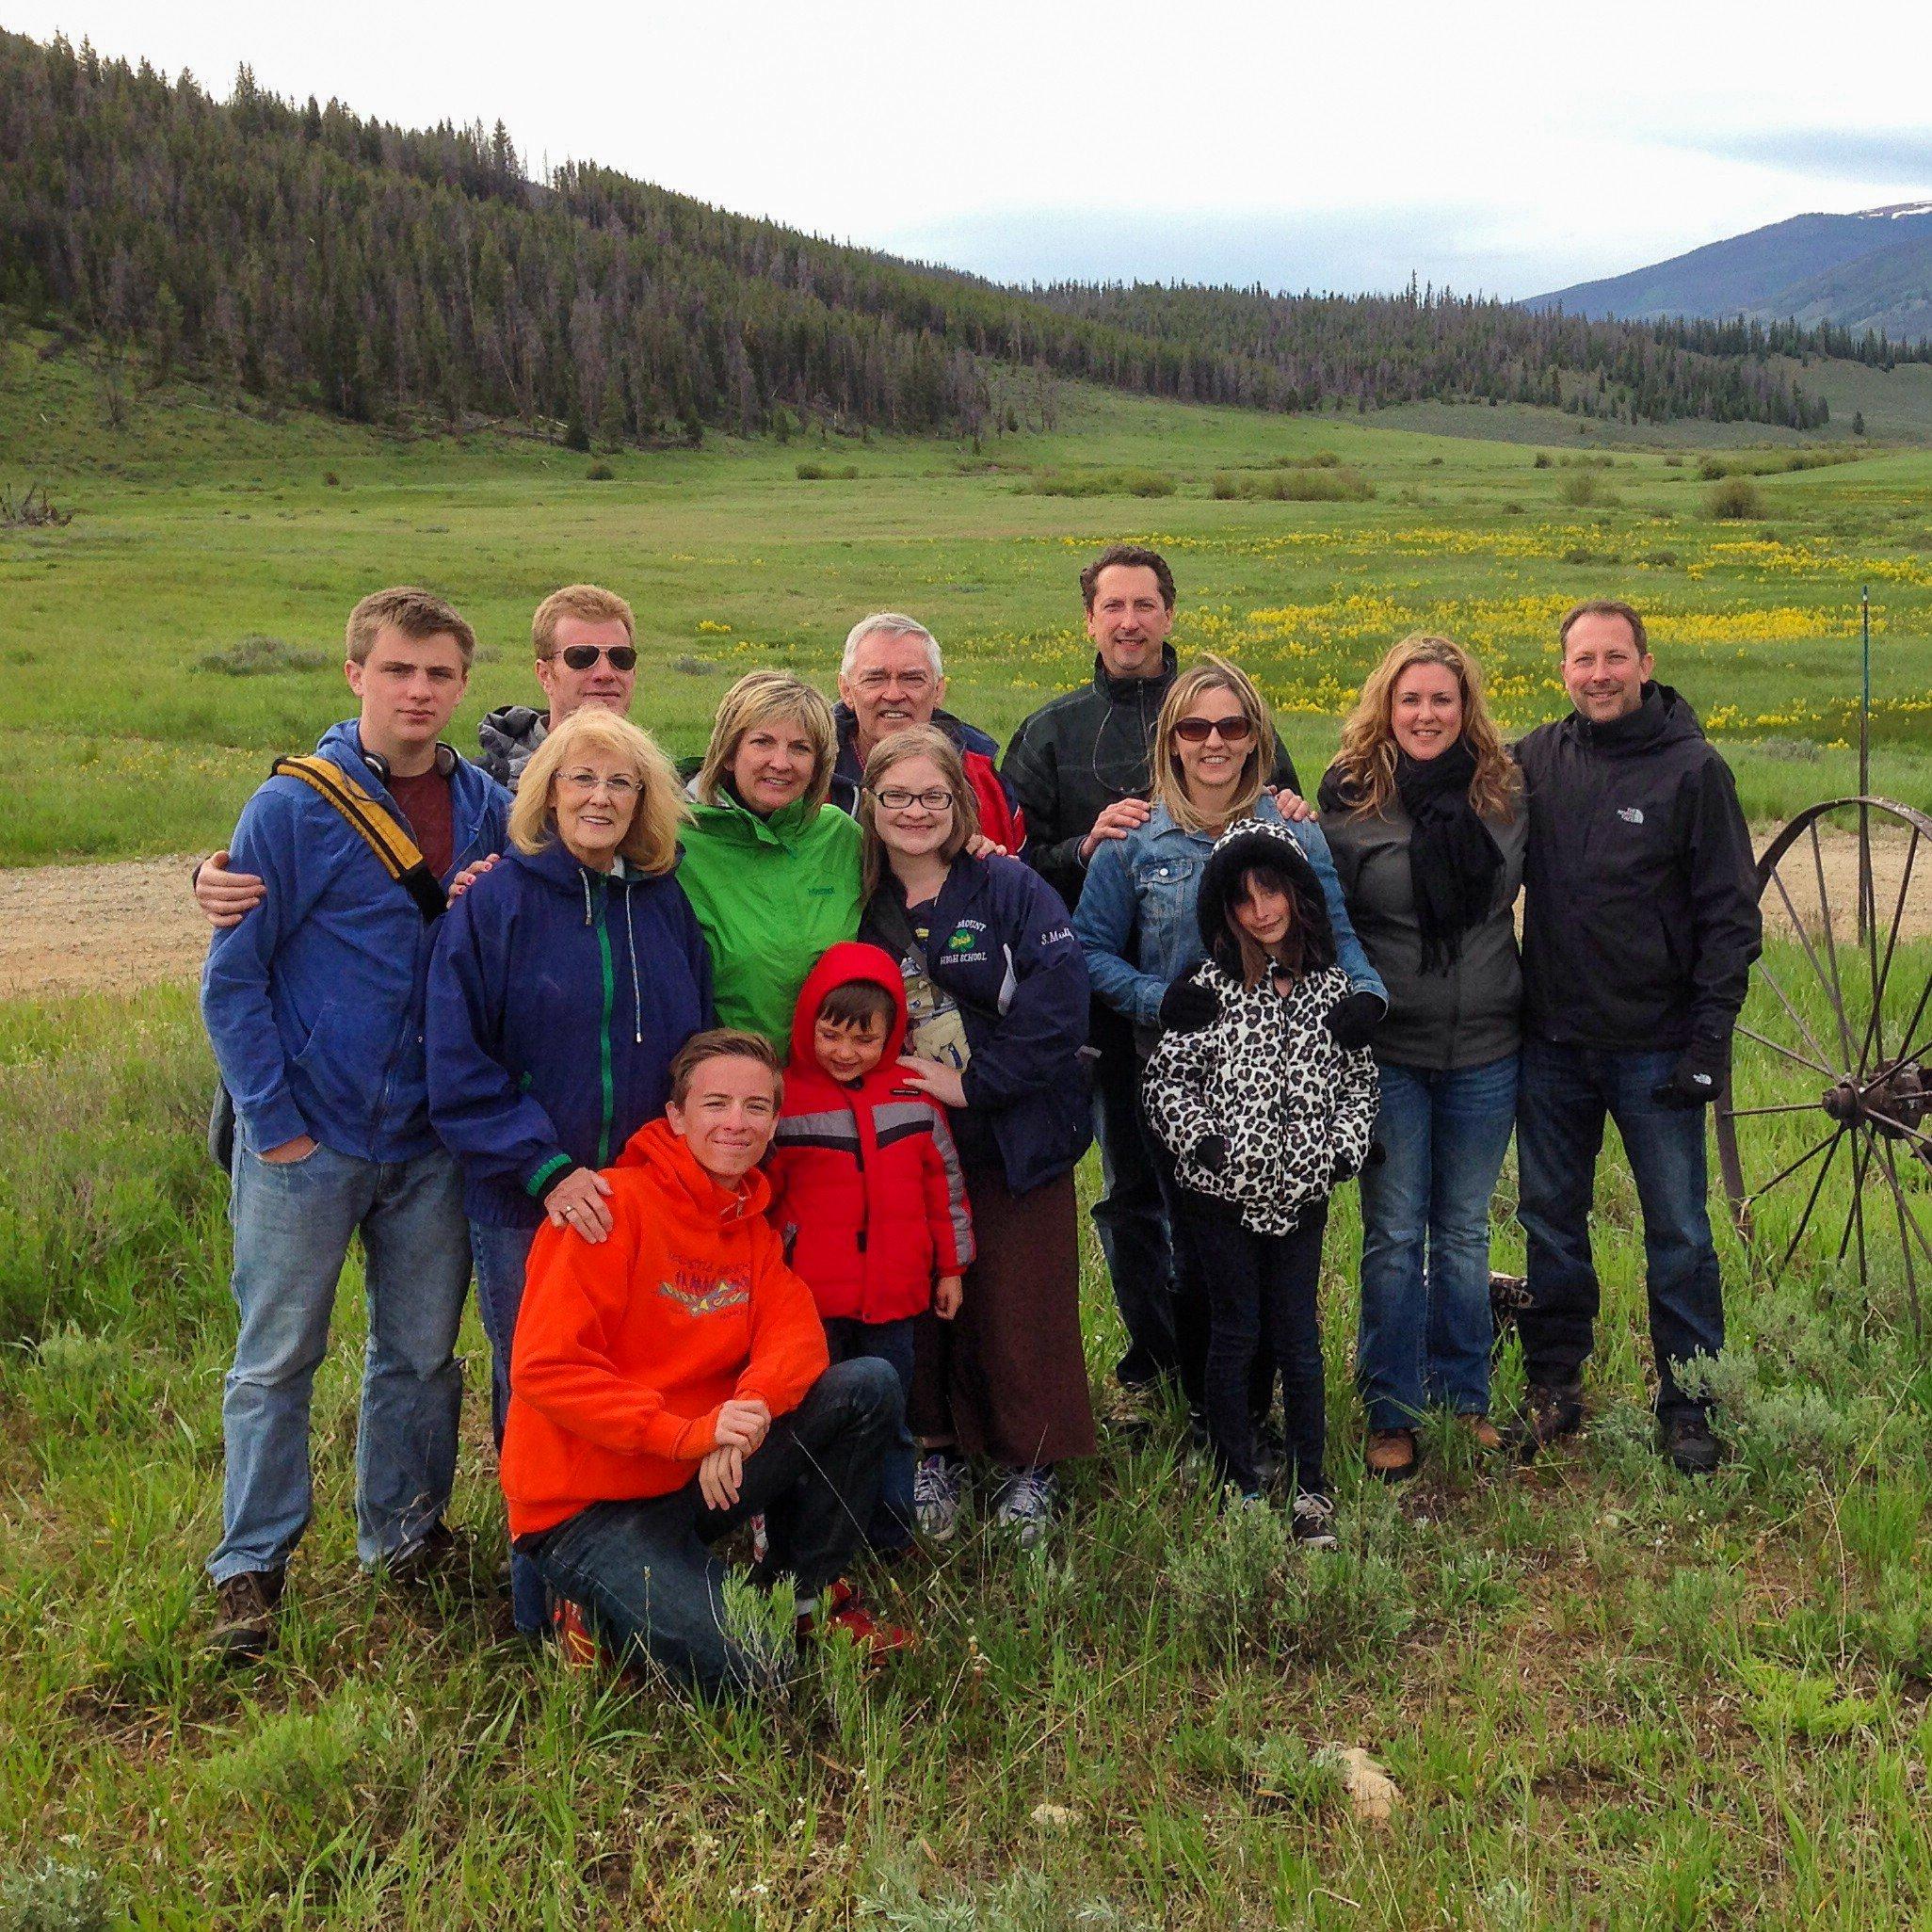 My family reunion vacation in Keystone, Colorado